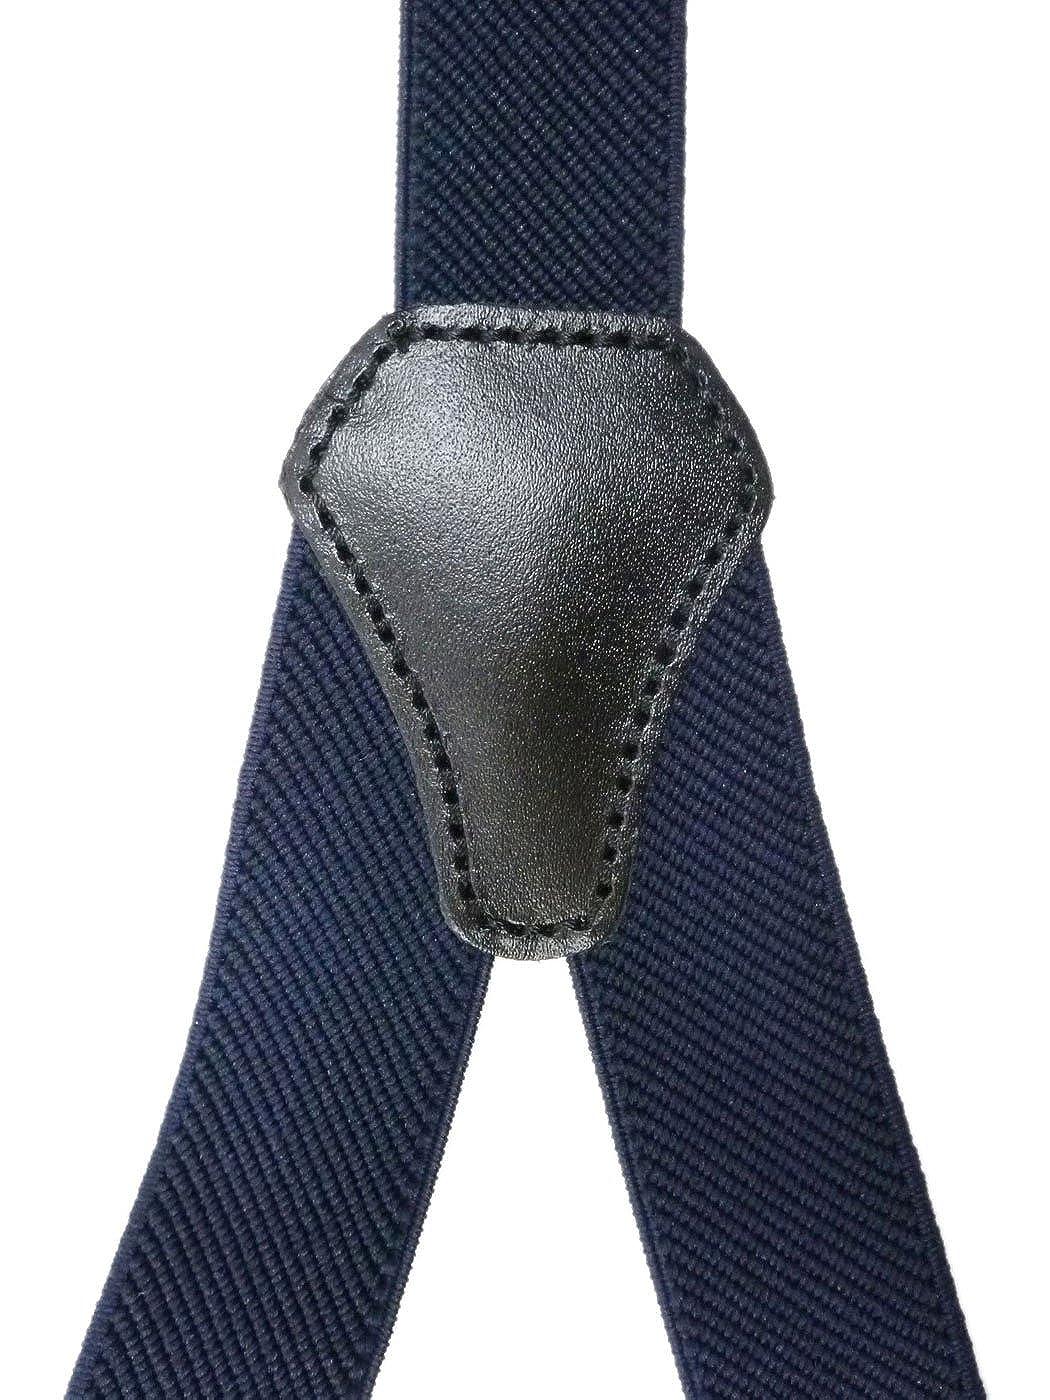 Olata Braces//Mitten Clips//Belts